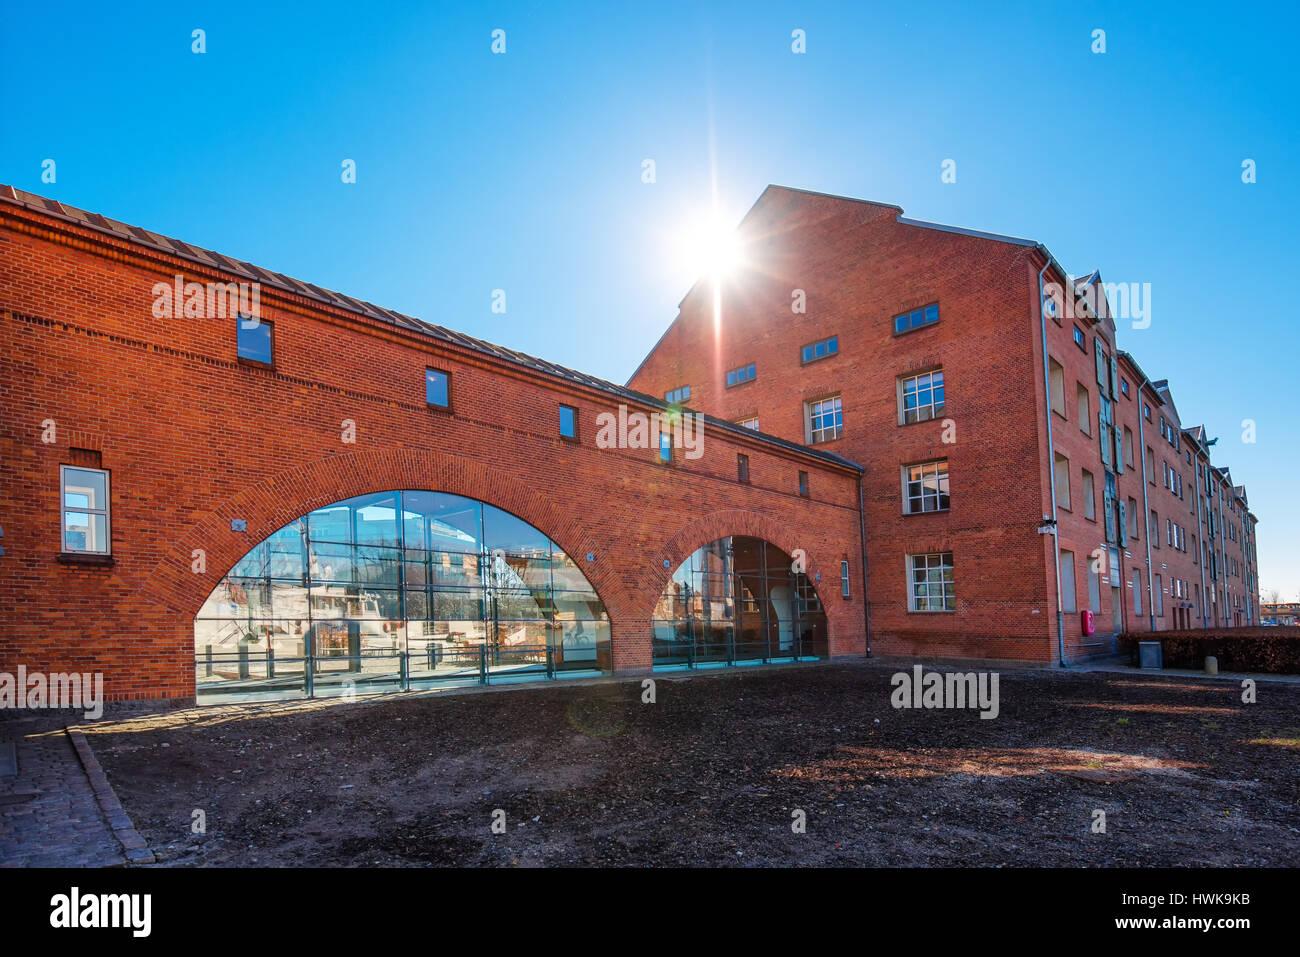 COPENHAGEN, DENMARK - MARCH 11, 2017: DuPont Nutrition Biosciences building in Copenhagen - Stock Image